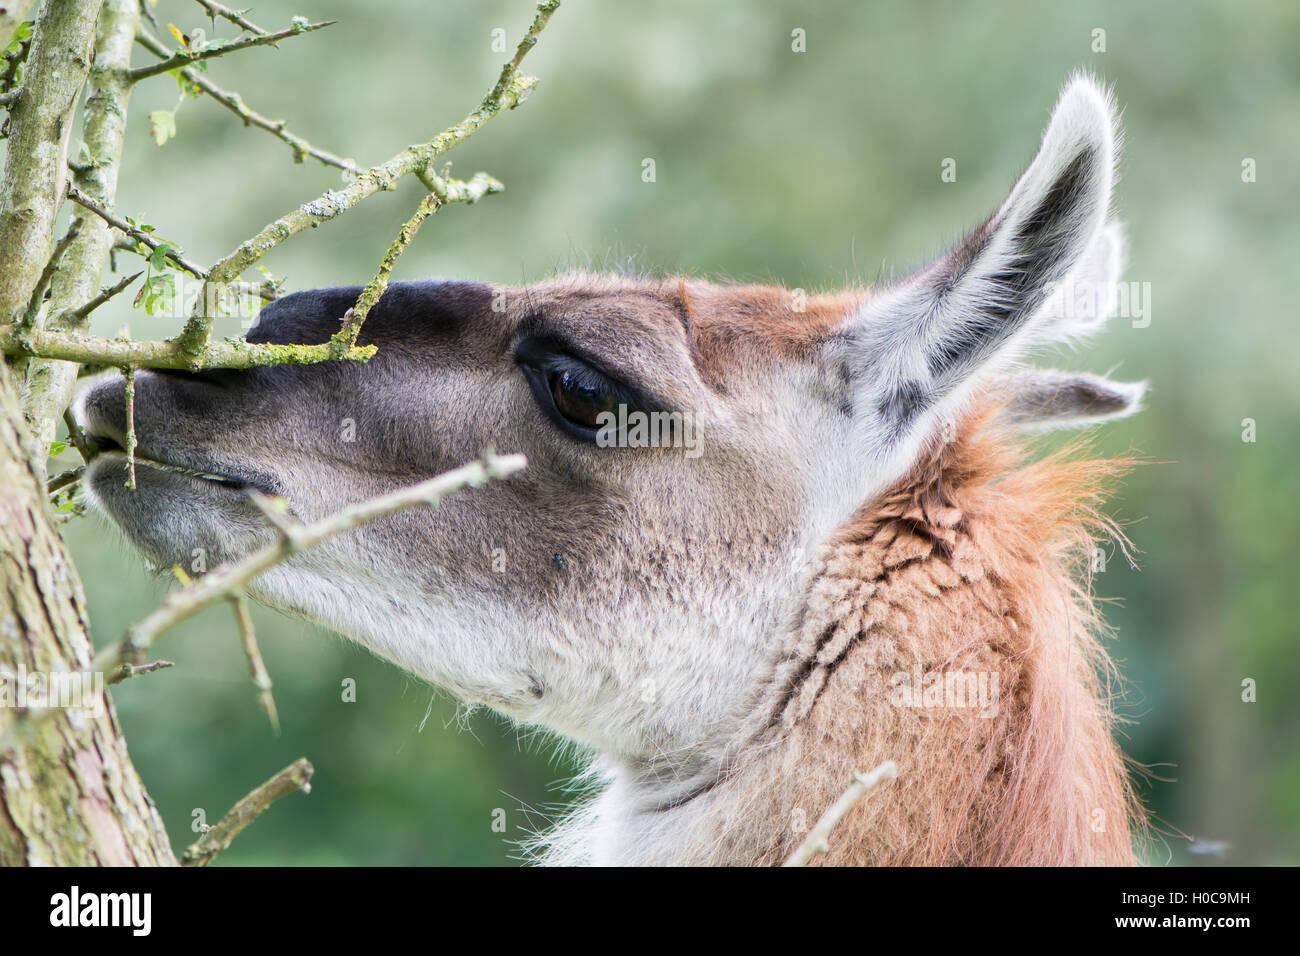 Llama grazing leaves from thorn bush. Domesticated camelid delicatly grazing leaves from hawthorn tree, avoiding - Stock Image